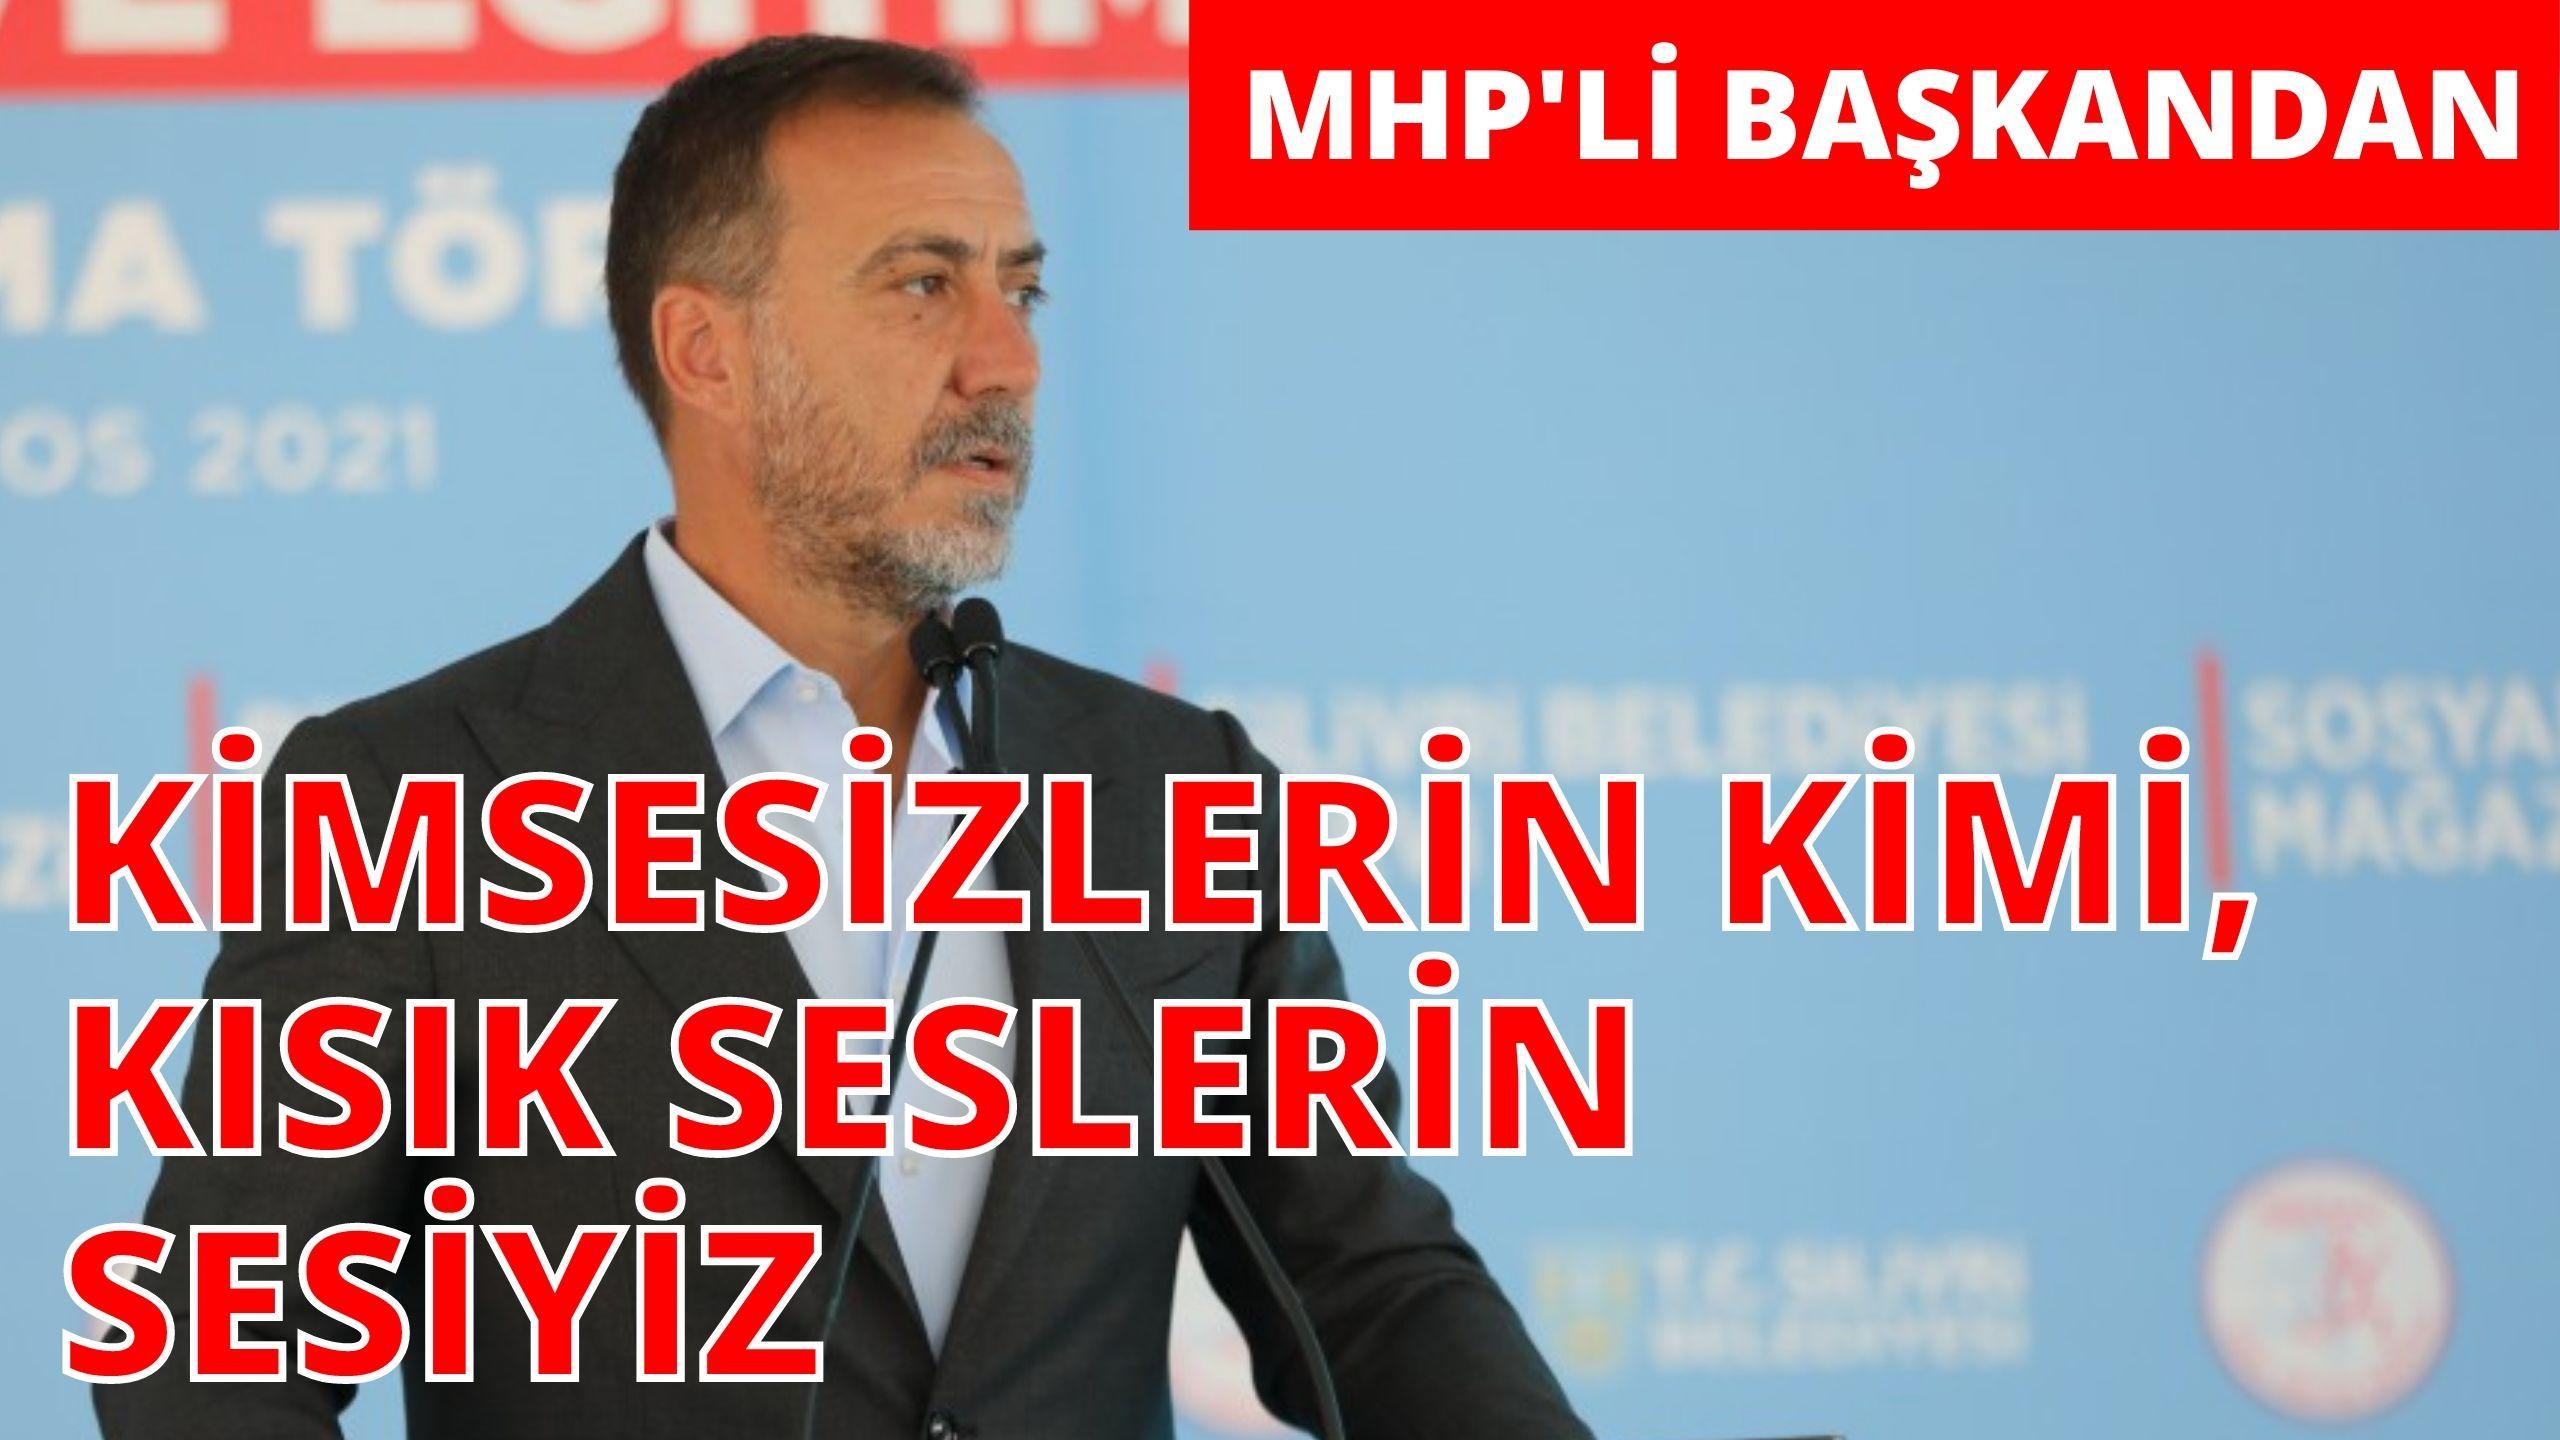 MHP'Lİ BAŞKANDAN 'SOSYAL' MESAJLAR